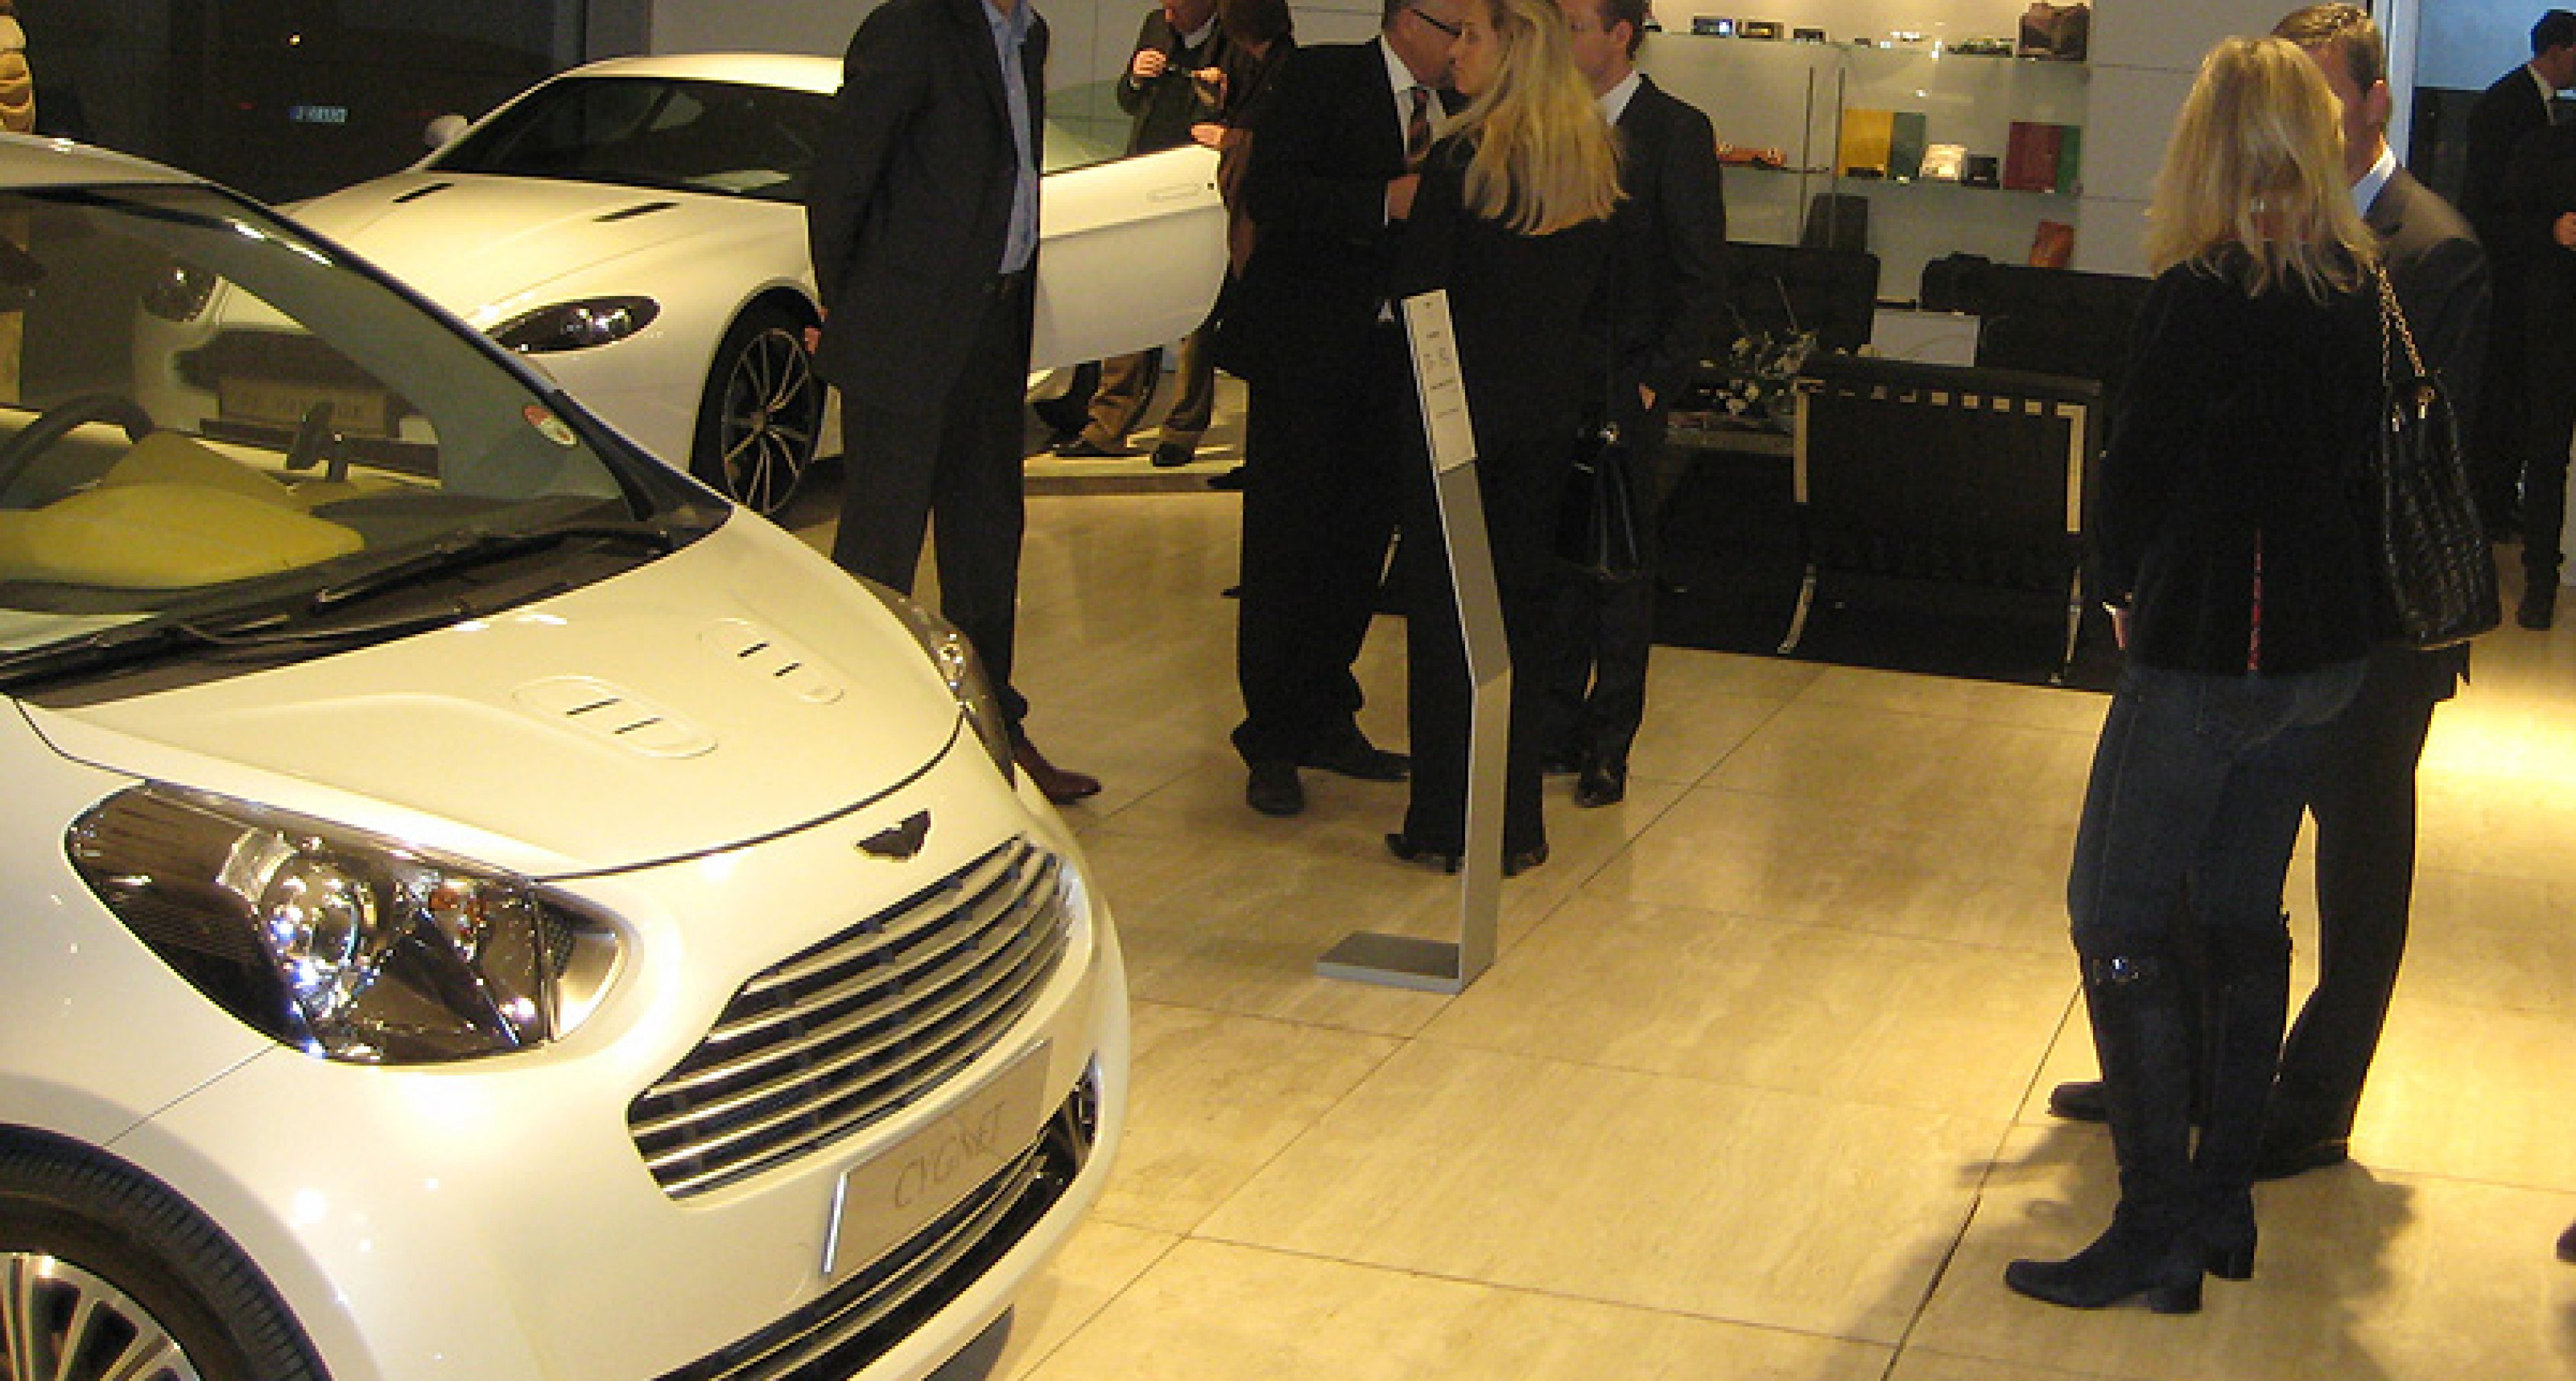 Sneak Preview: Aston Martin Cygnet in Düsseldorf